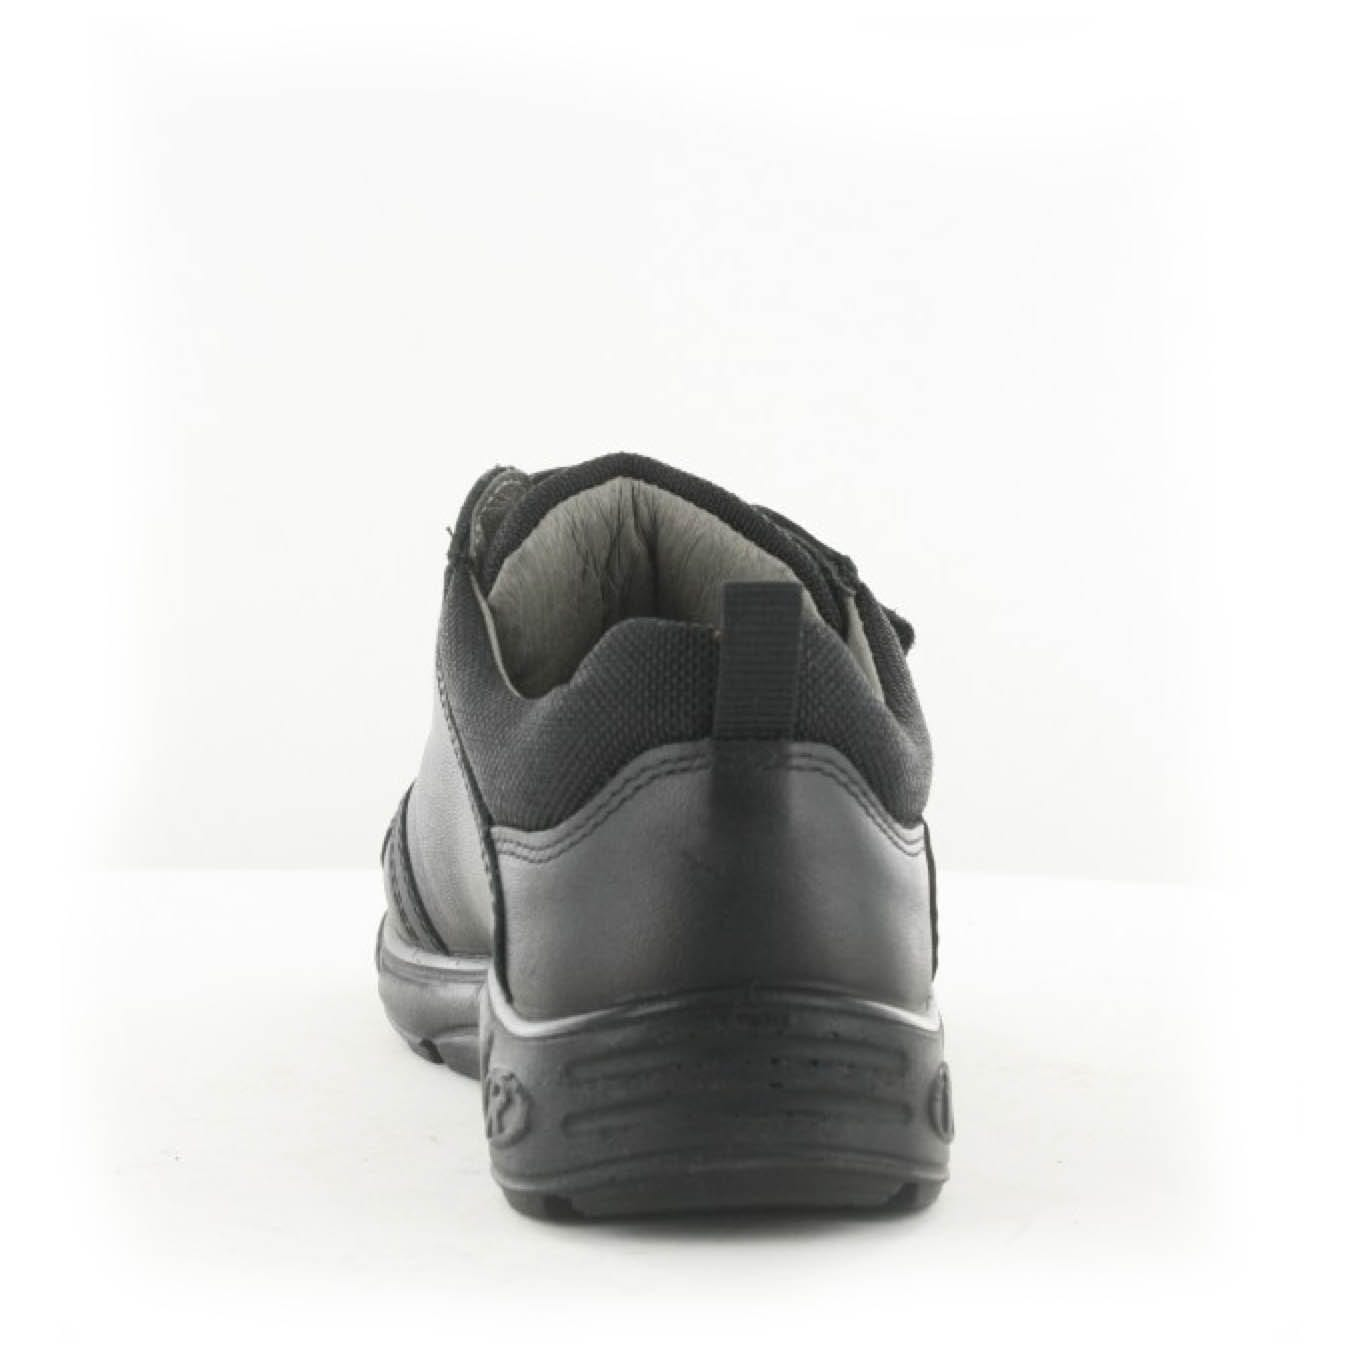 Geox Boys Narrow Fit School Shoes